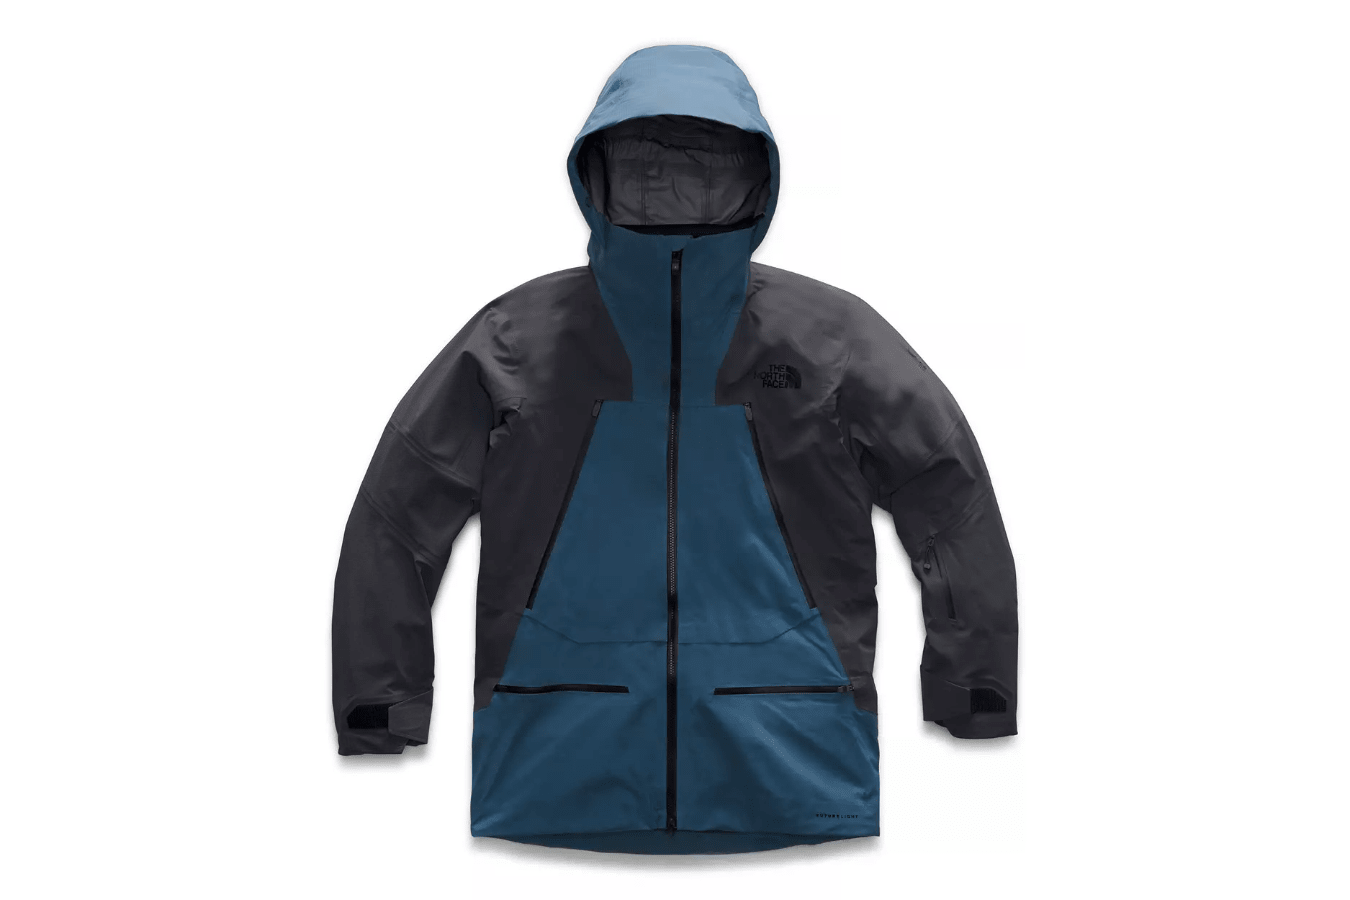 The North Face Futurelight Purist Jacket